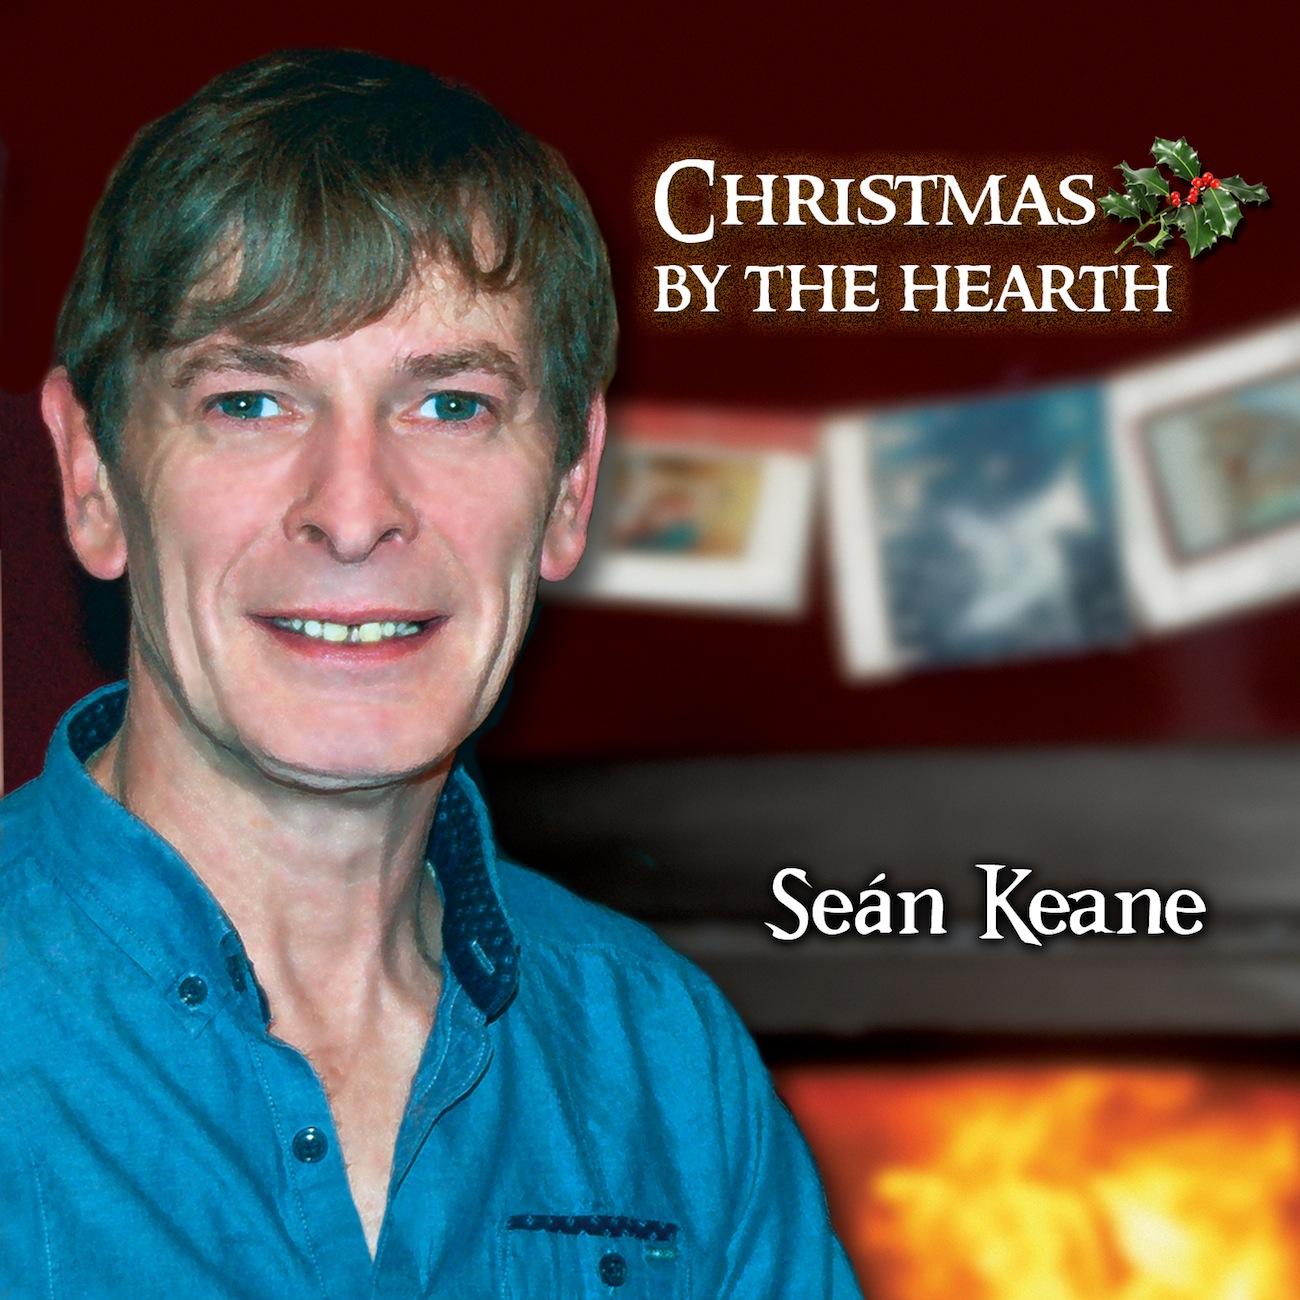 a chairde st tropez hanging chair seán keane agus cháirde the journal of music news